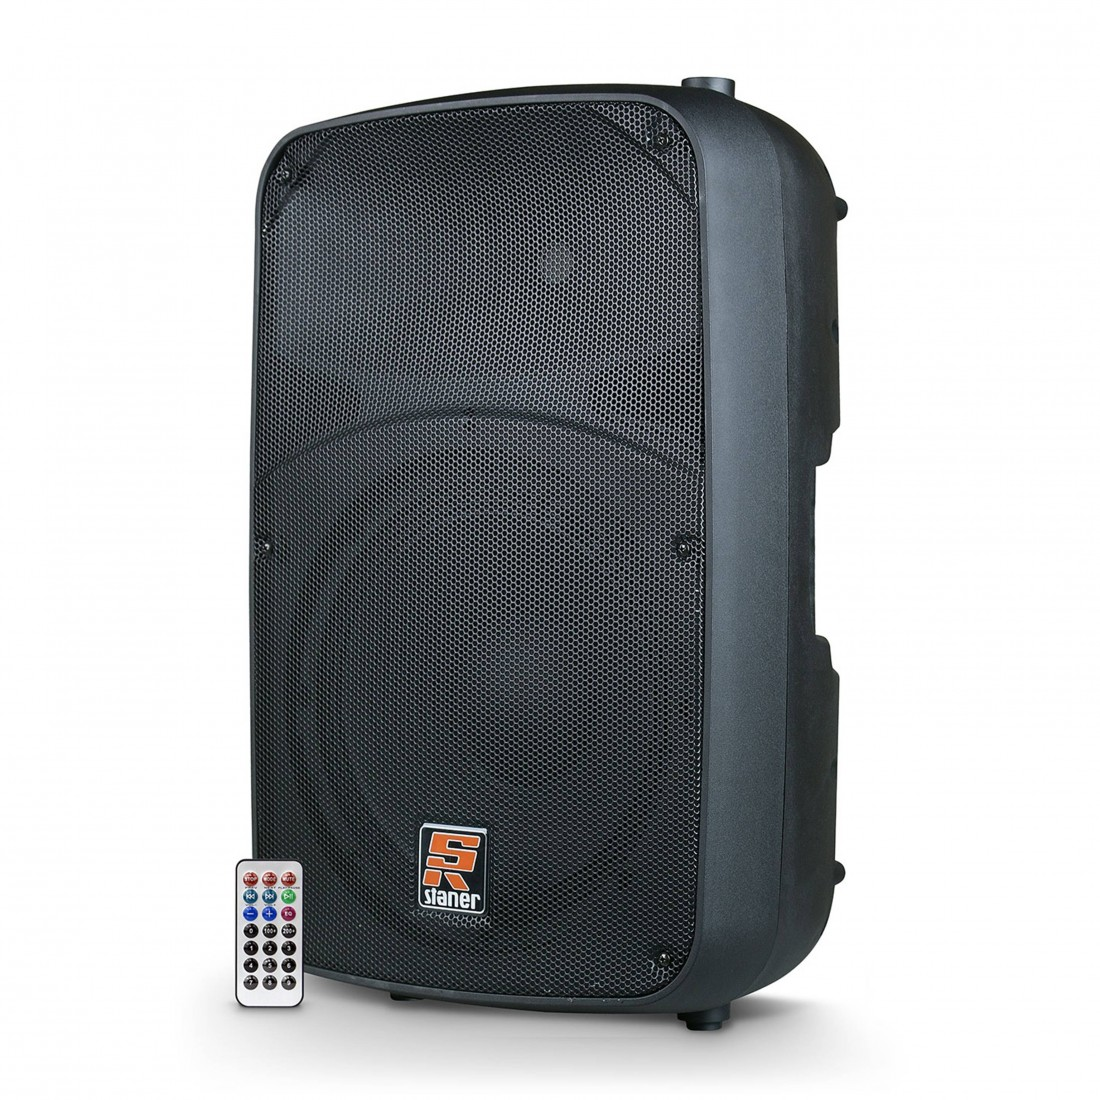 Imagem do produto Caixa Amplificada Staner 12 polegadas 200 watts SR-212